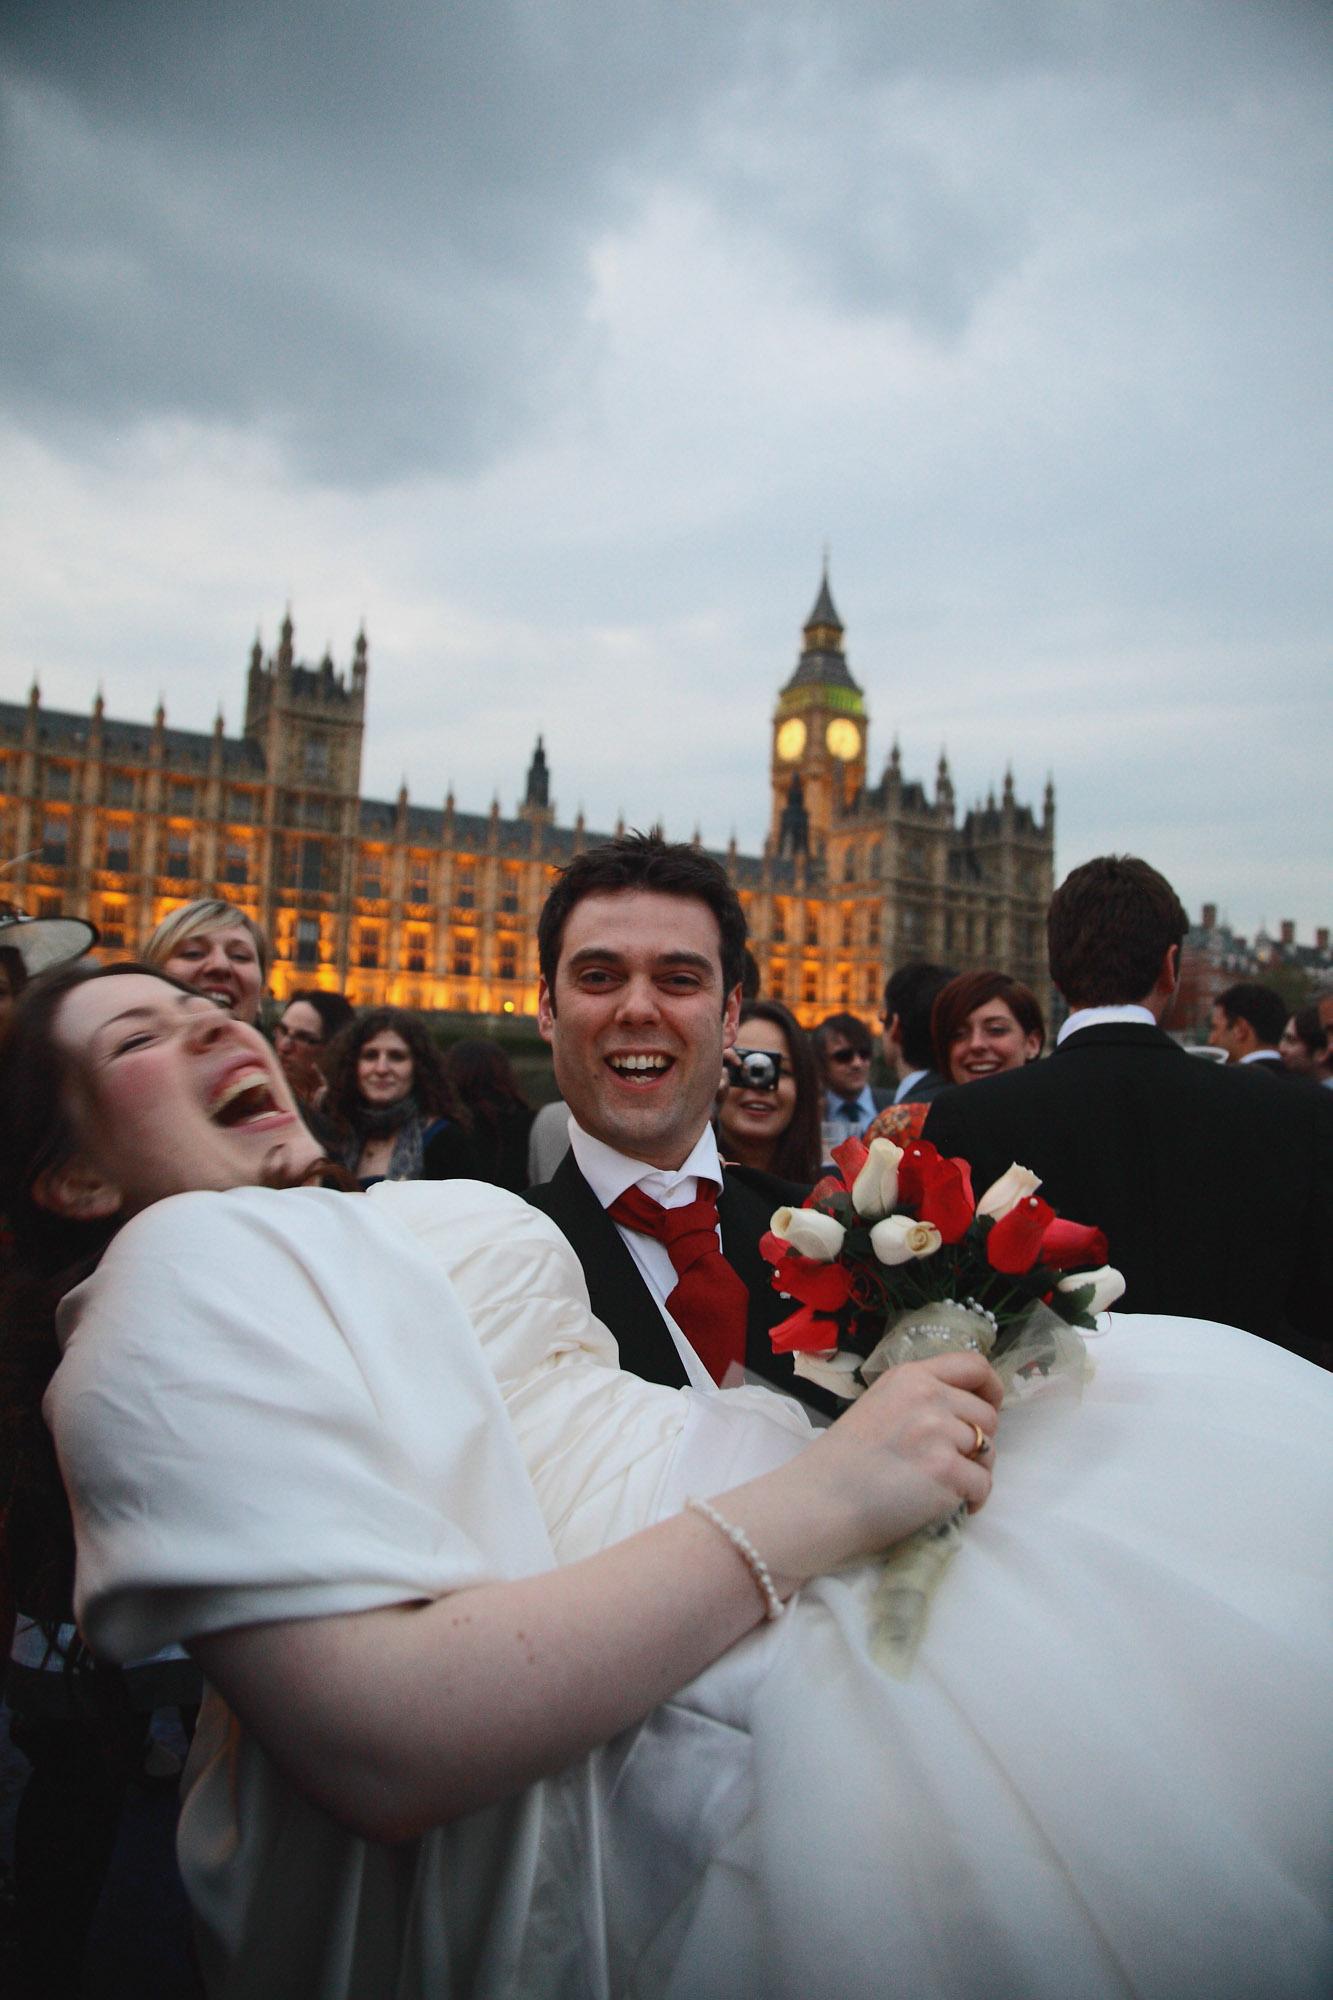 weddings-couples-love-photographer-oxford-london-jonathan-self-photography-98.jpg